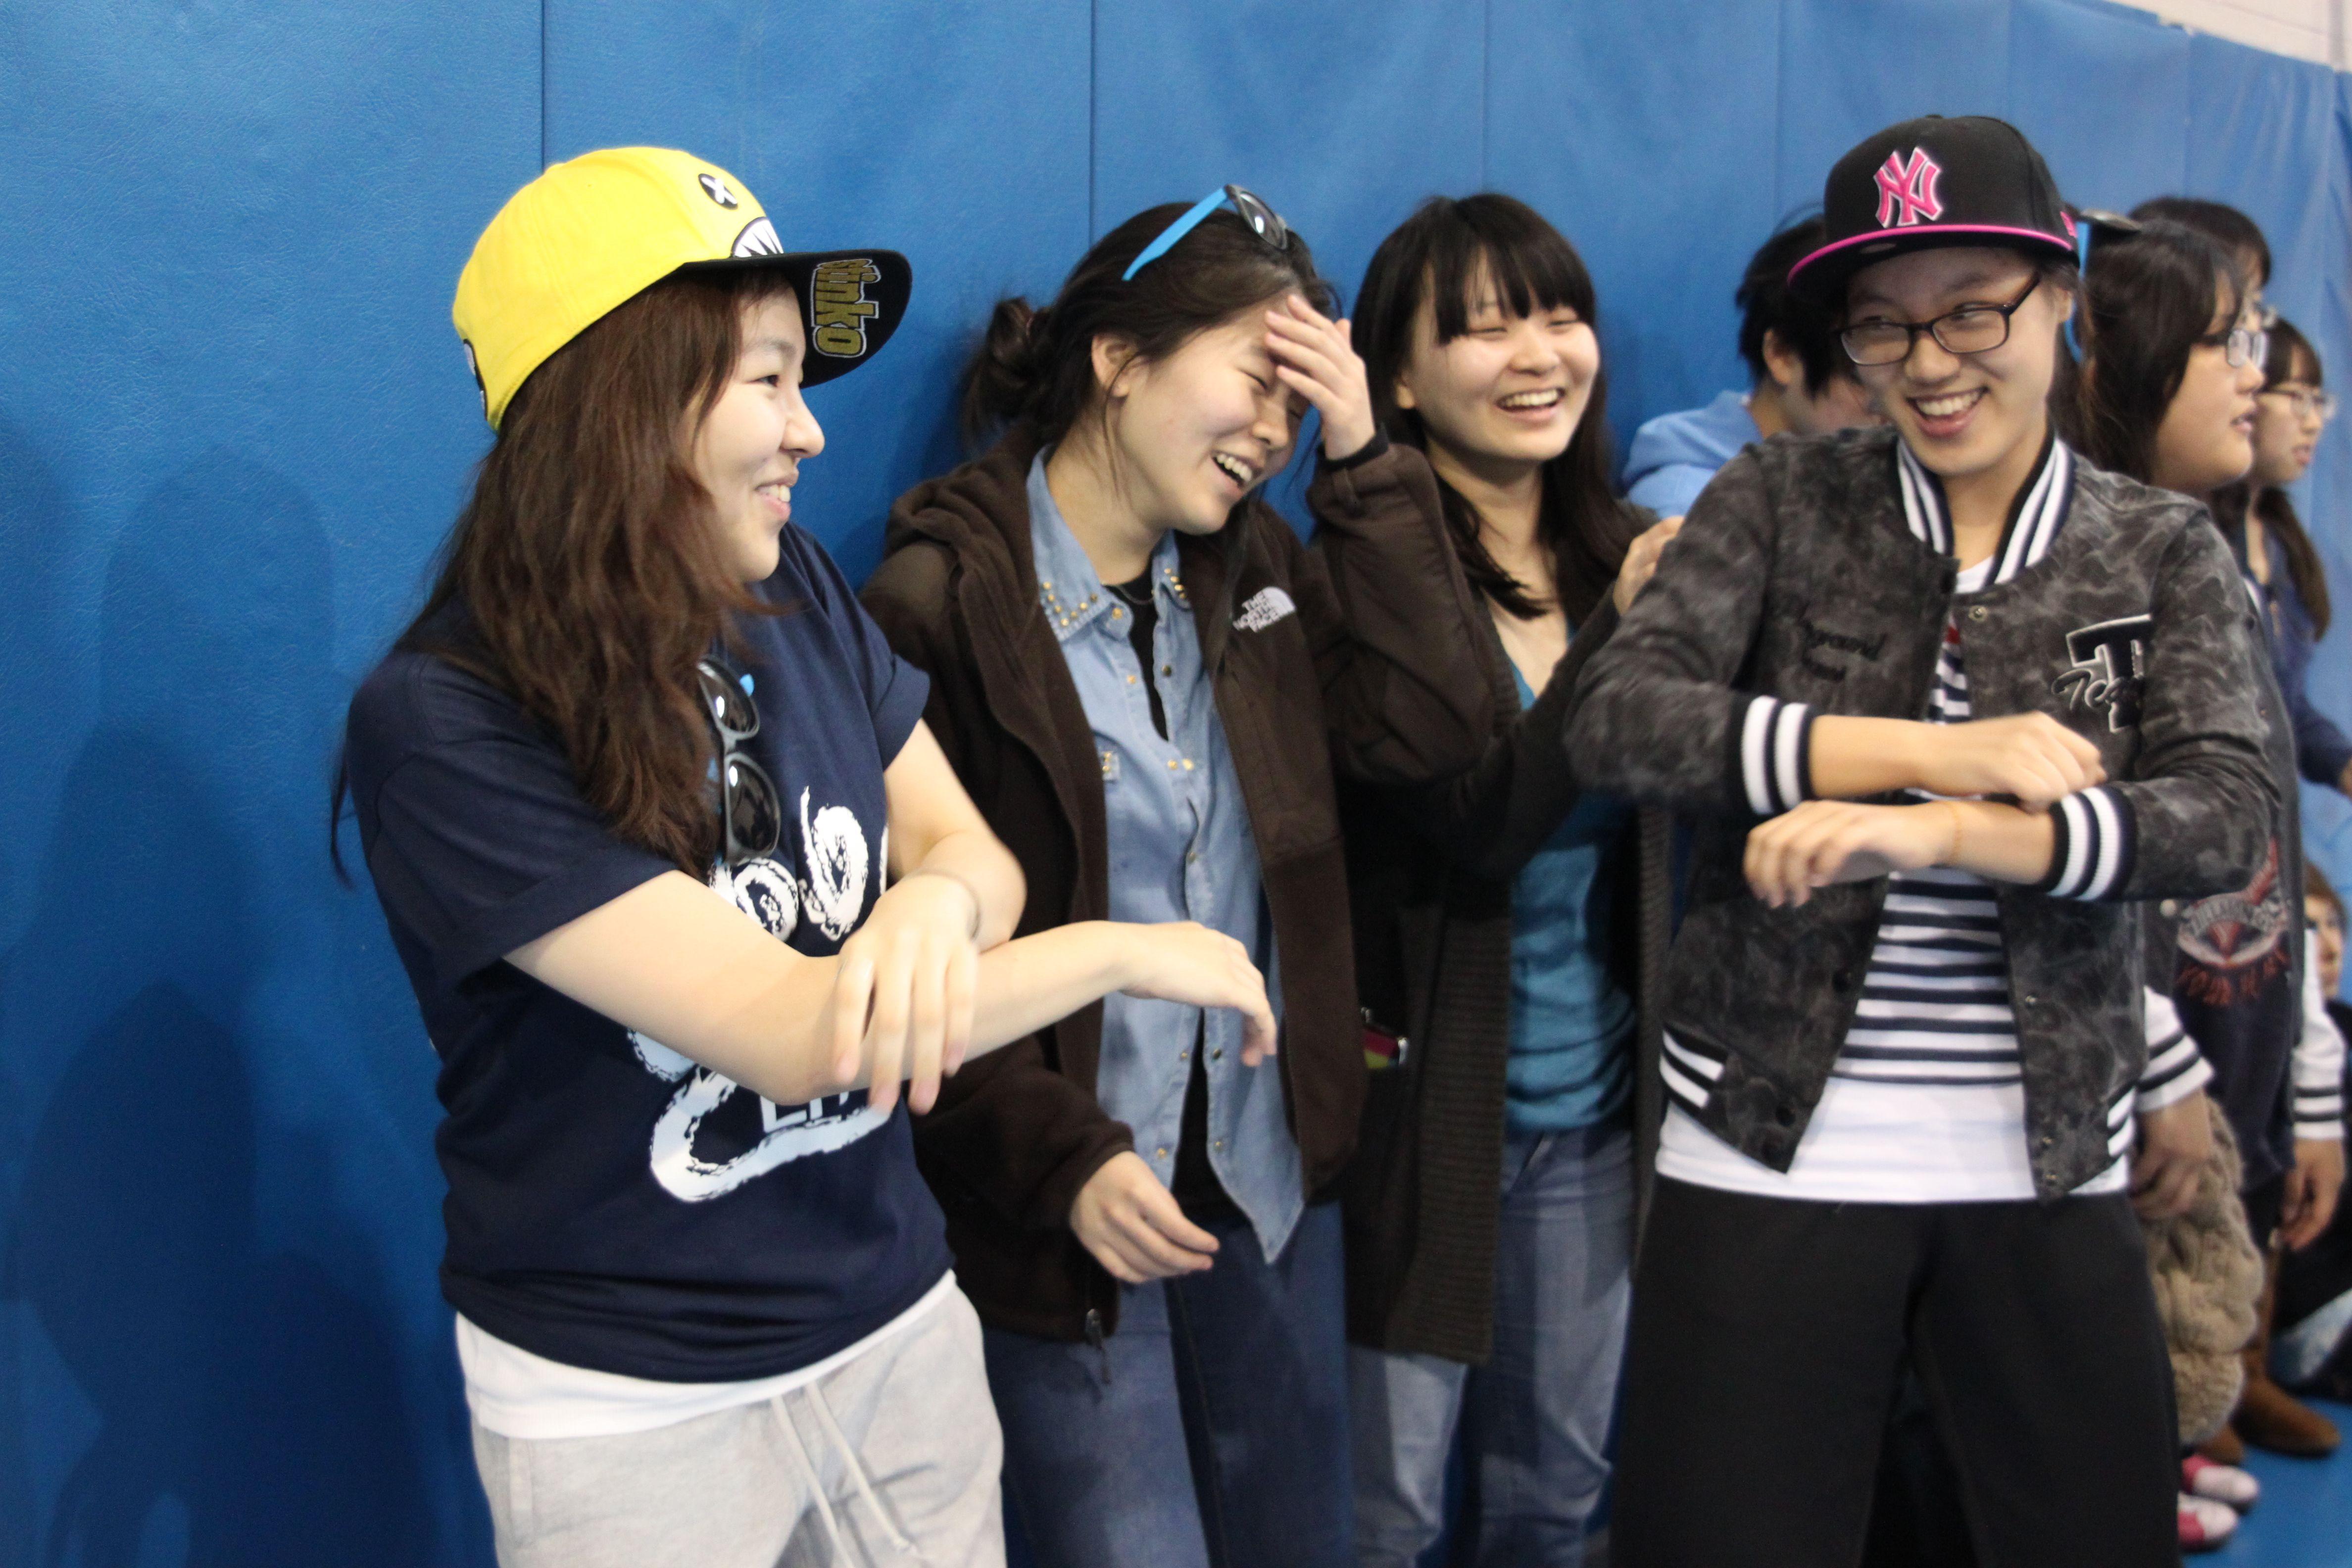 1/31/13 Blue team spirit